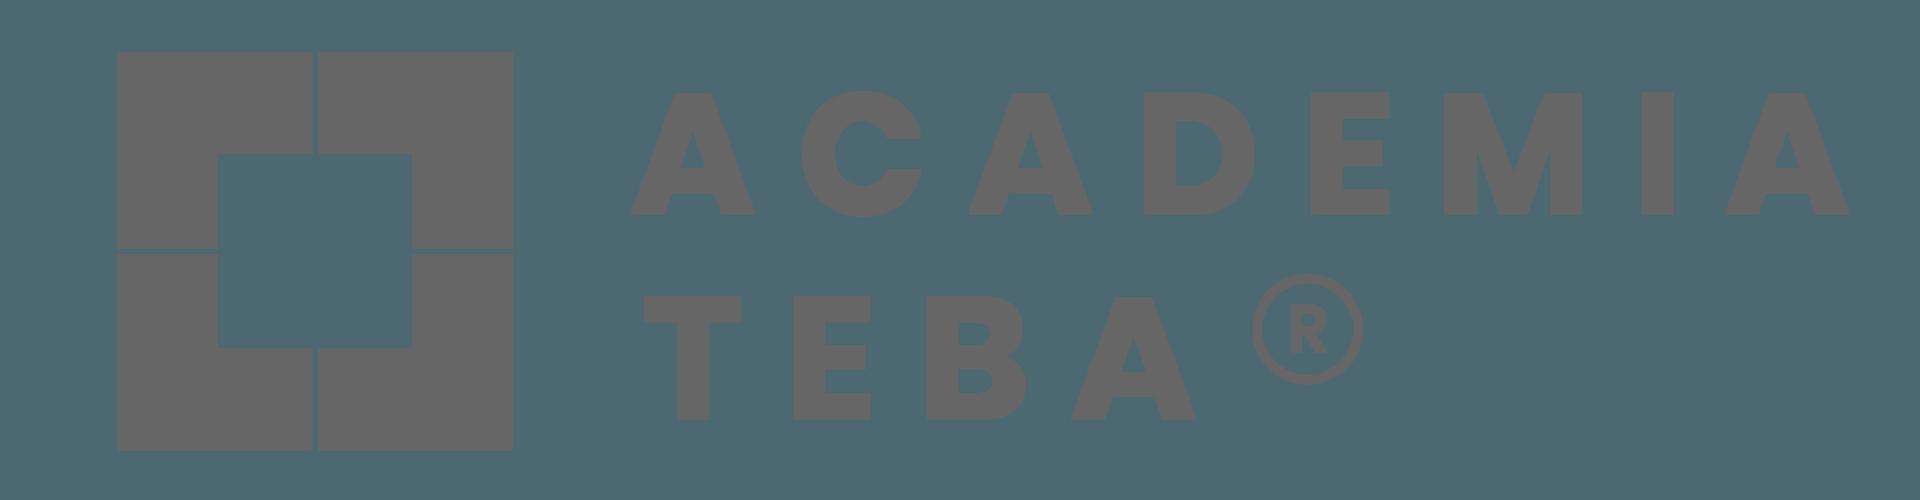 Marca Academia Teba